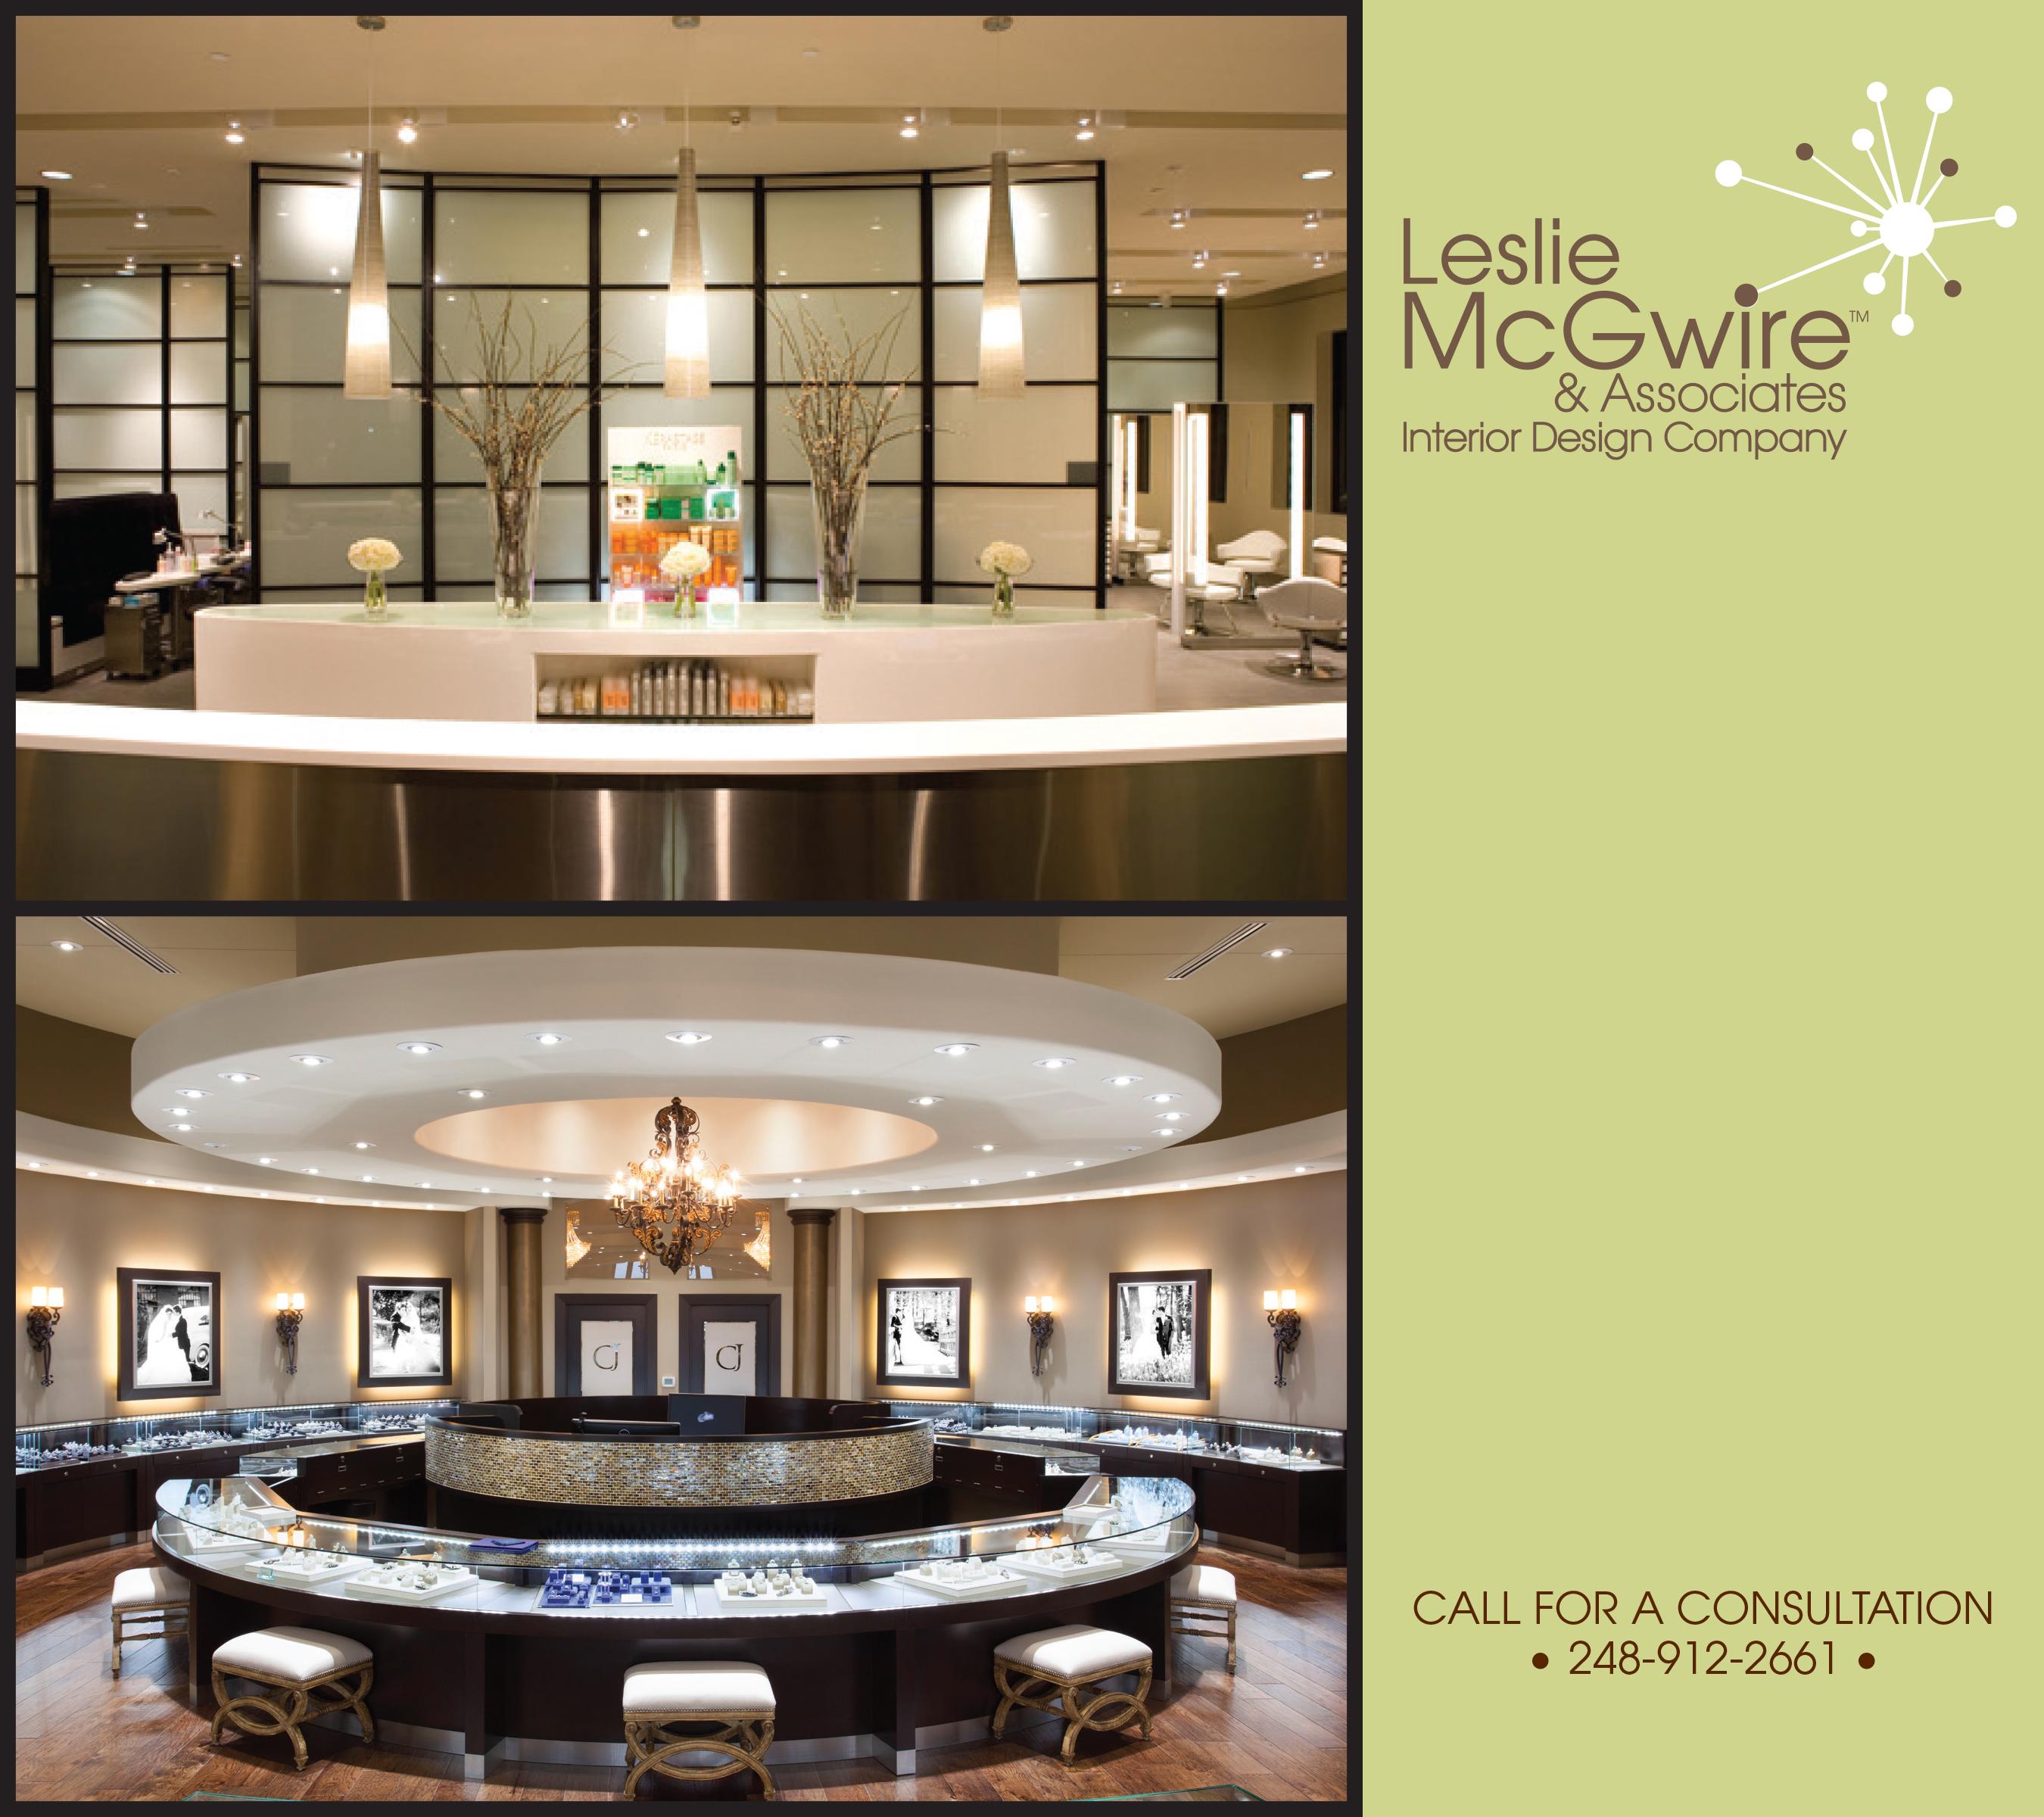 Interior Design Award Winning Tricho Leslie McGwire On Behance